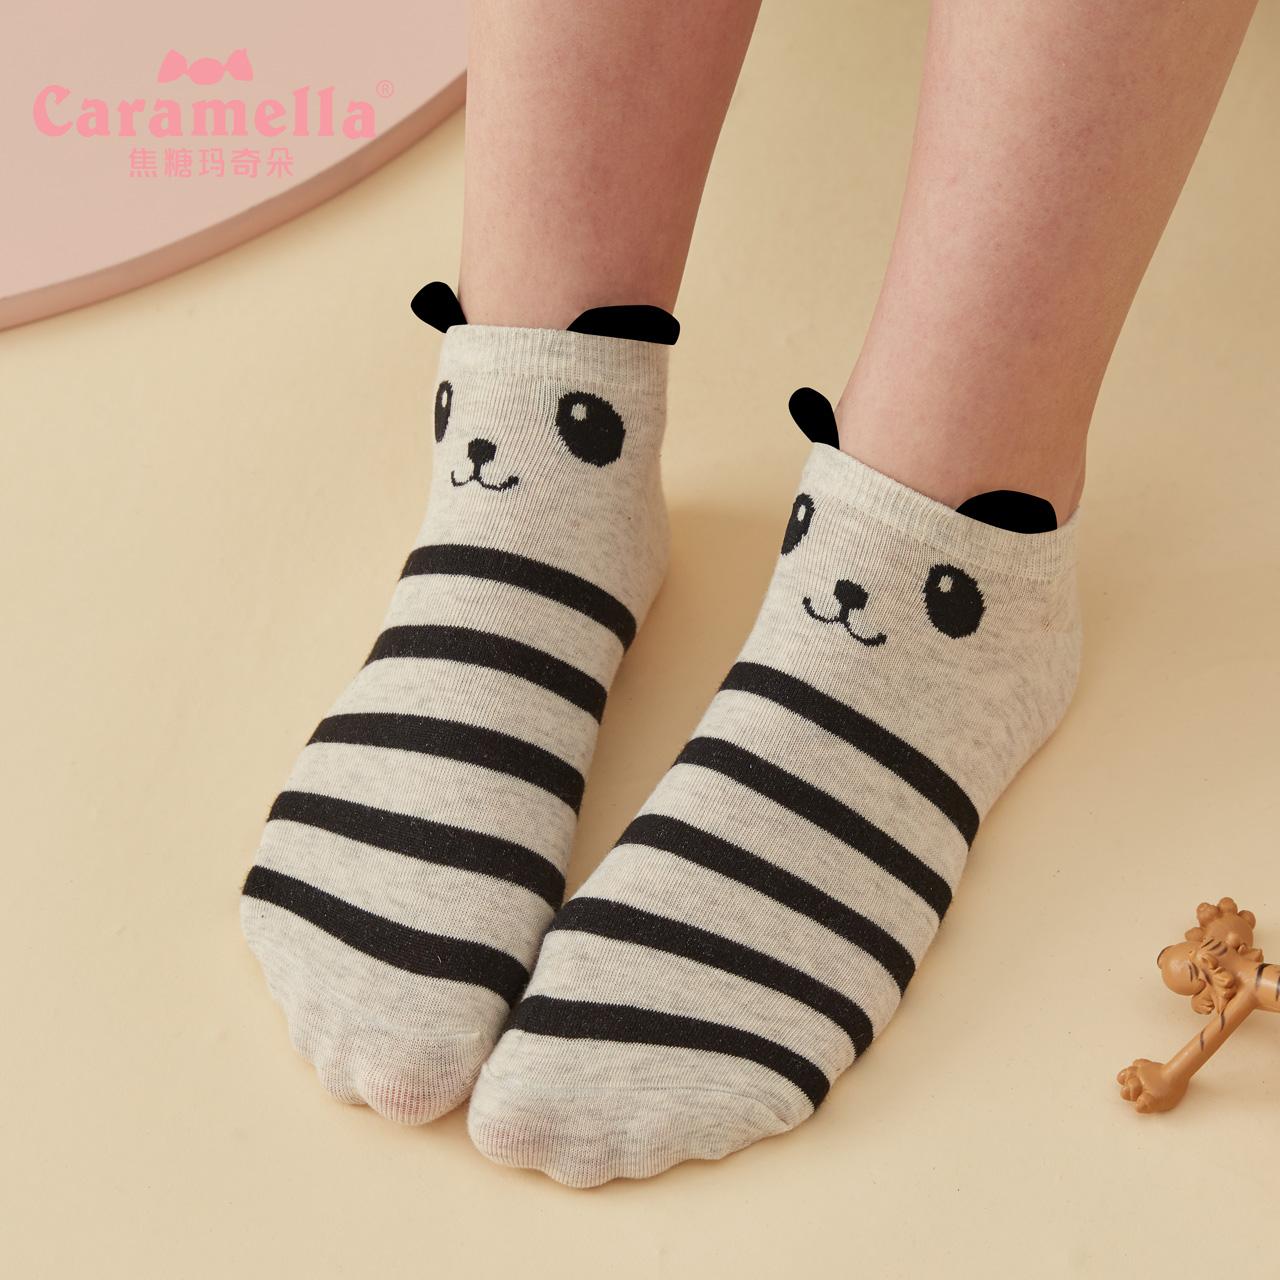 CARAMELLA袜子女ins潮夏天棉薄款短袜浅口可爱卡通透气船袜子